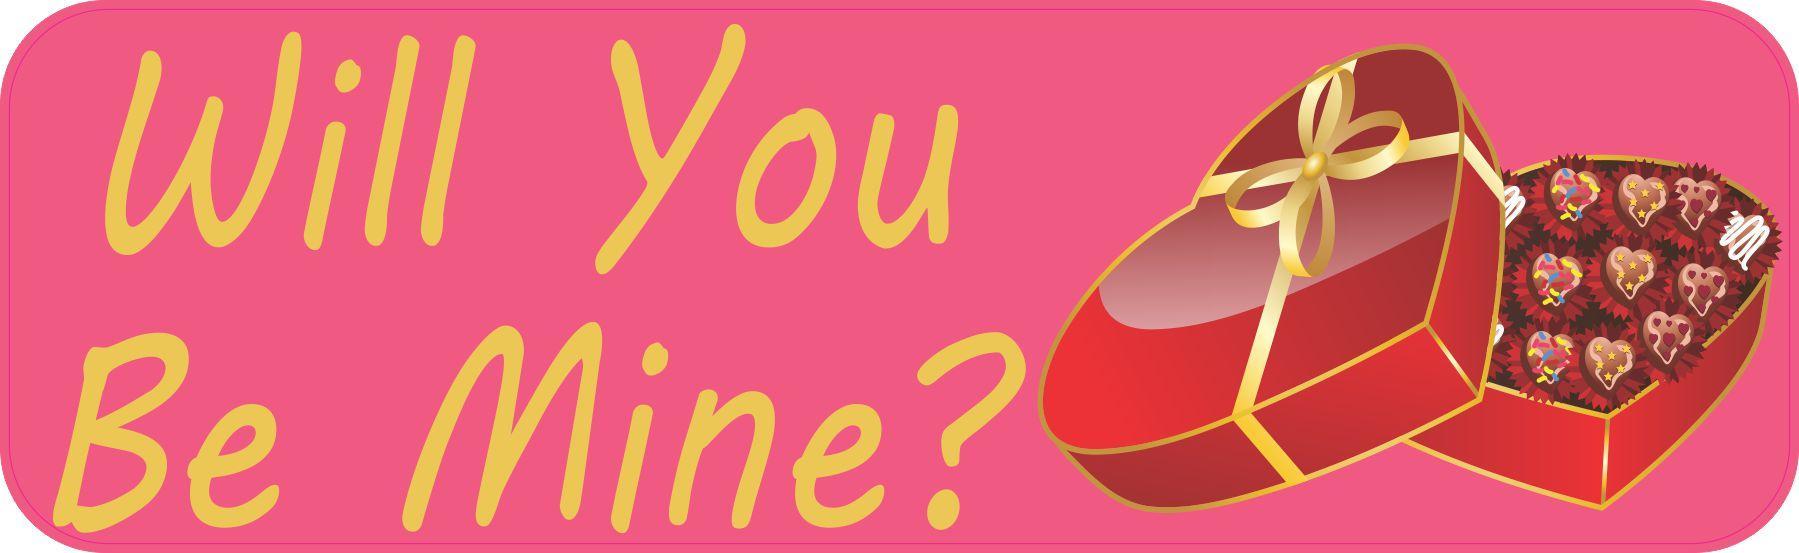 Will You Be Mine Valentine Stickers